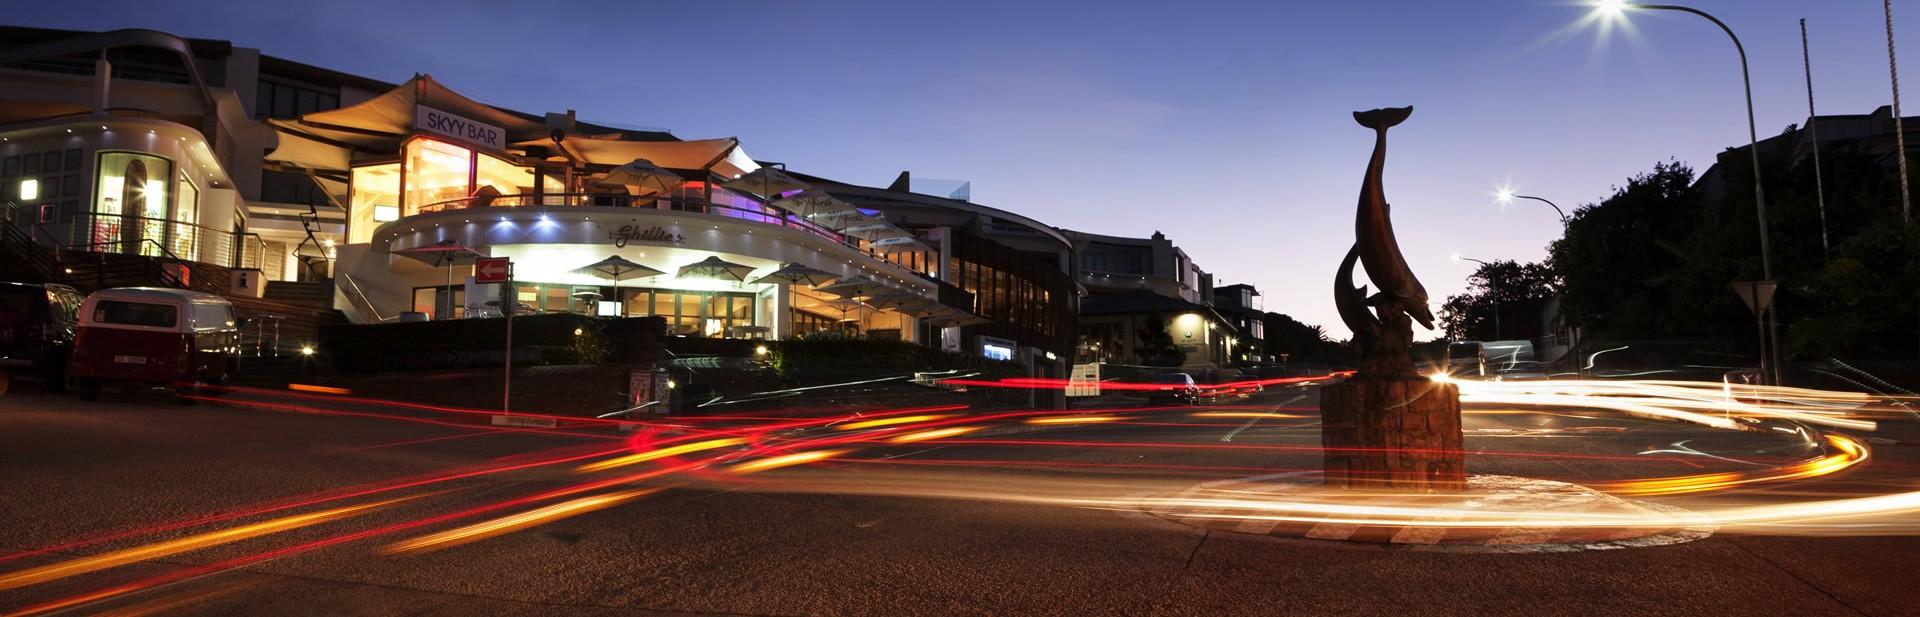 Plett main street roundabout